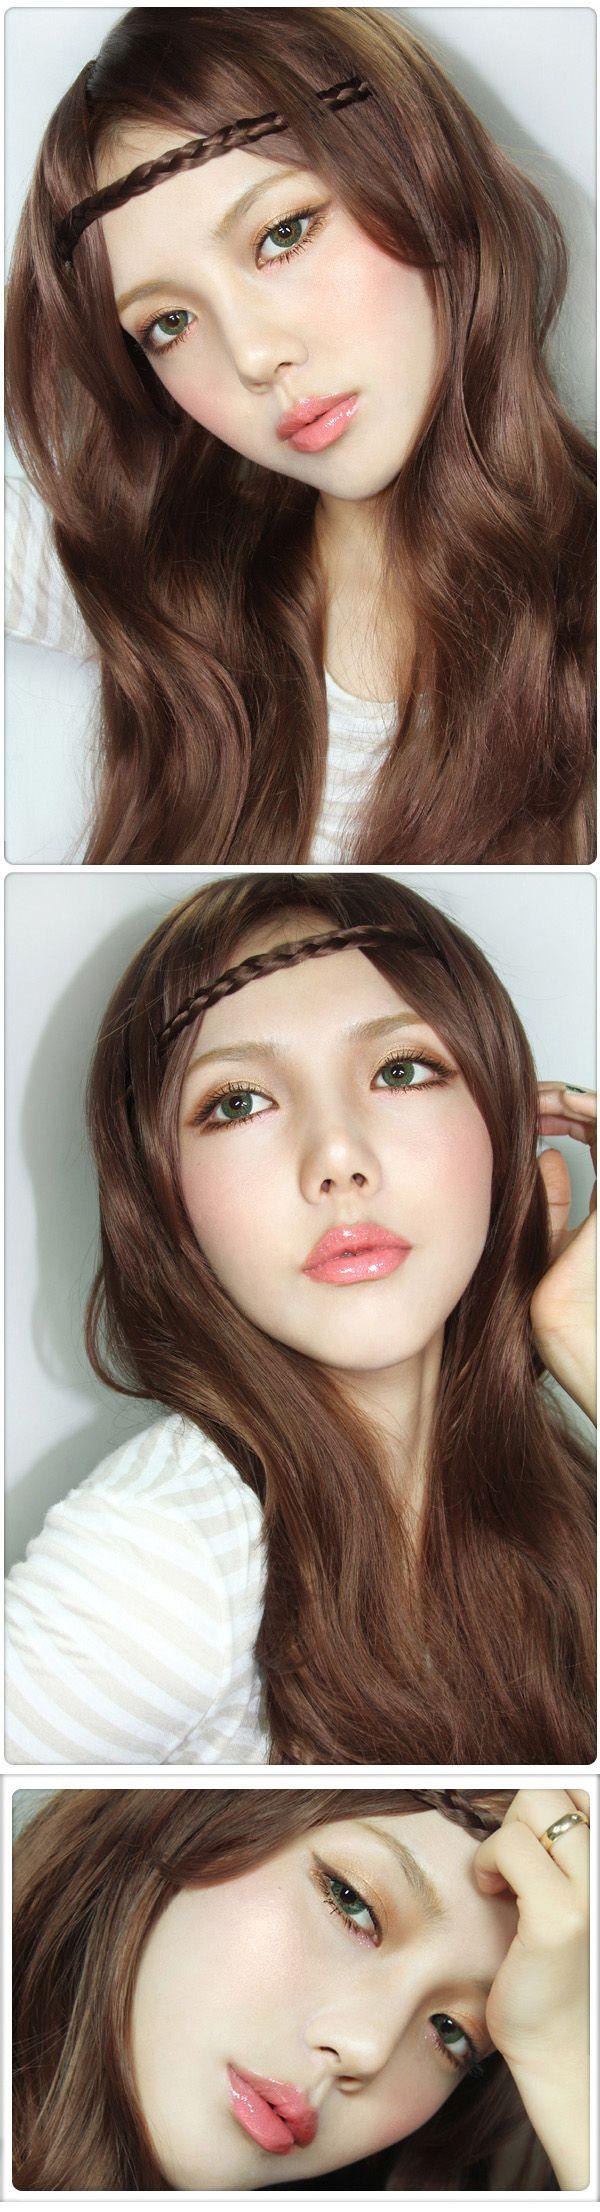 keywords: asian, beauty, korean, makeup, cute, pretty, girl, brown, hair, natural, ulzzang